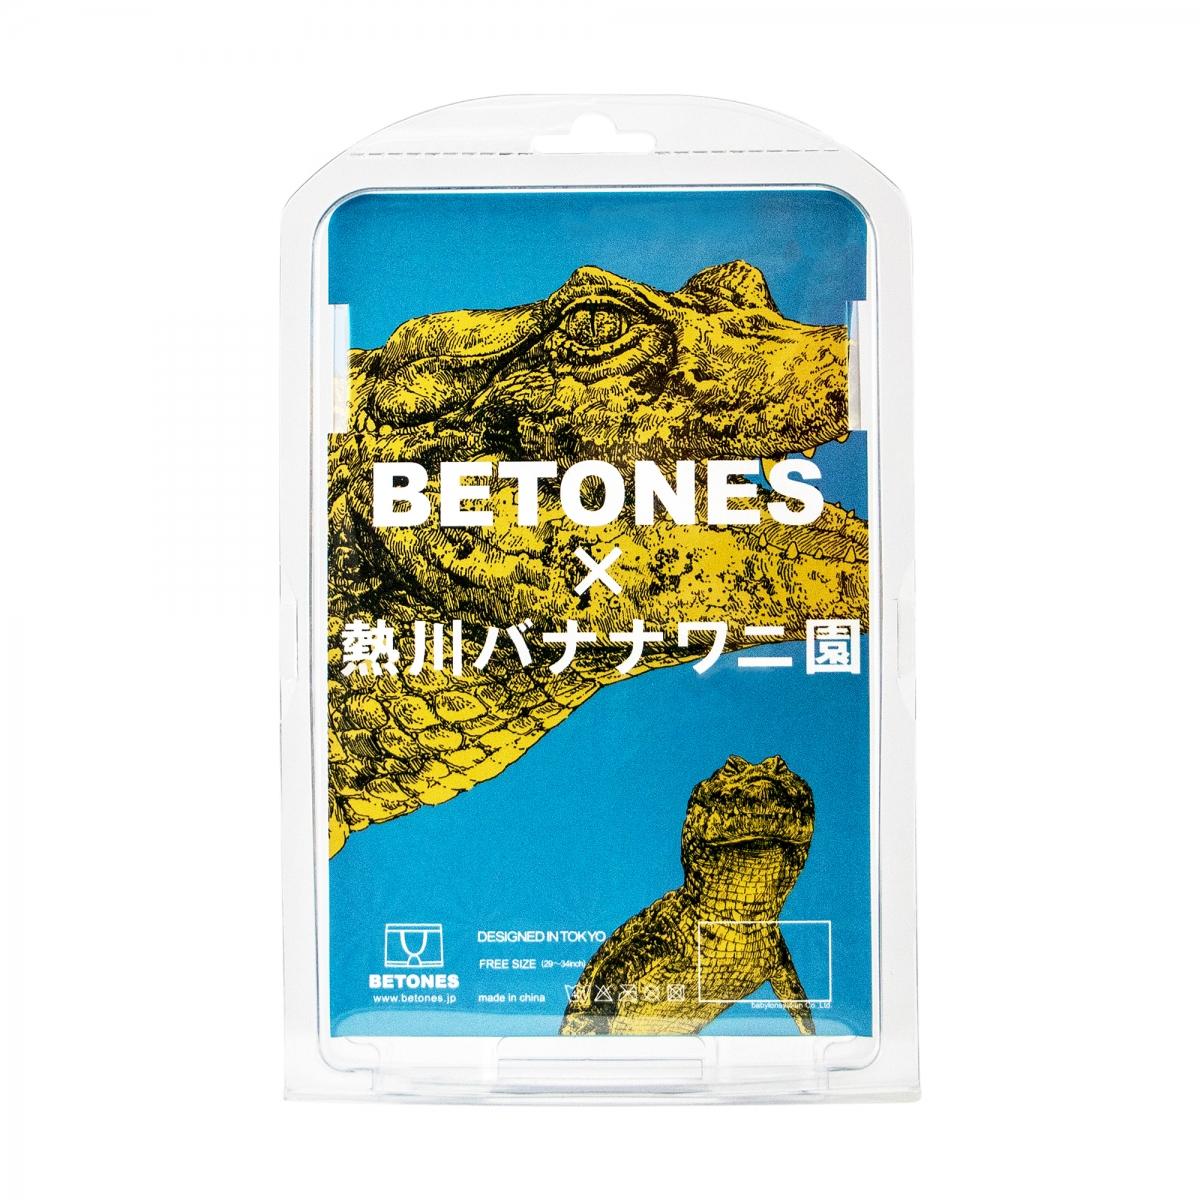 BETONES ビトーンズ MENS ボクサーパンツ  BANANA WANI EN BAN001 BLUE / GREY / PINK Free